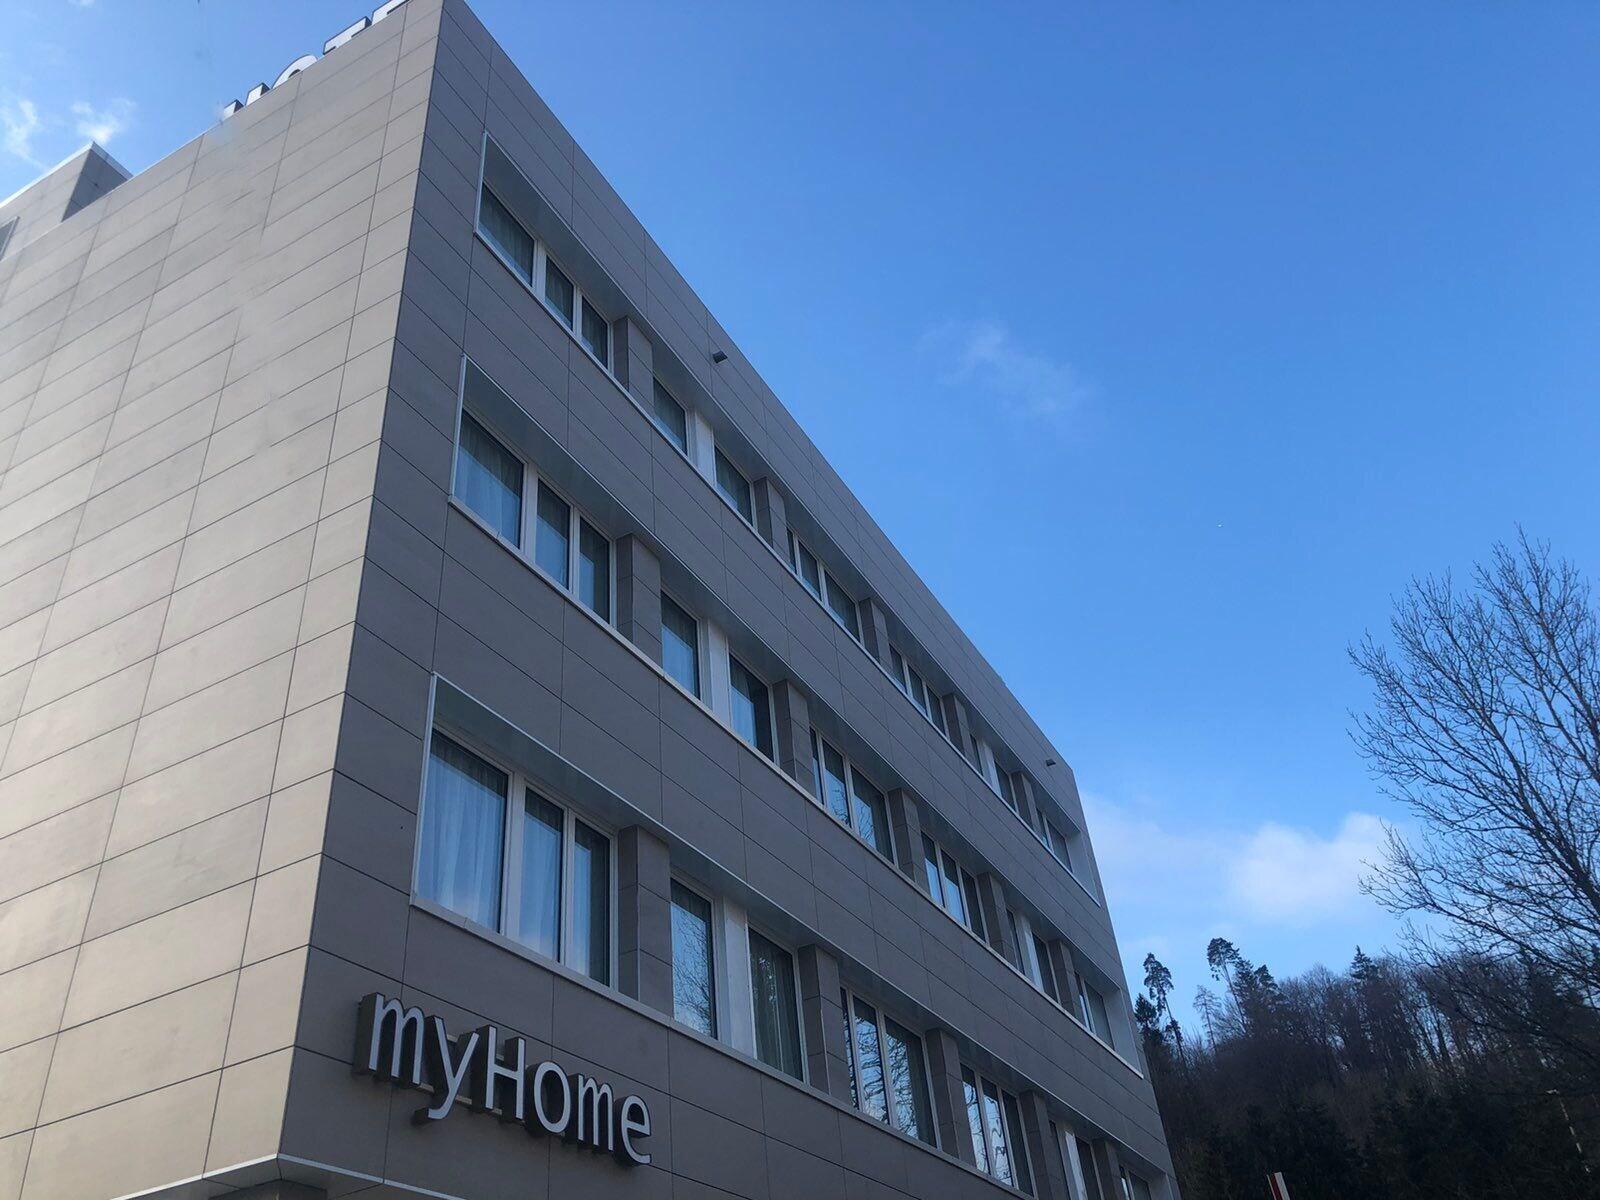 My Home Hotel, Winterthur